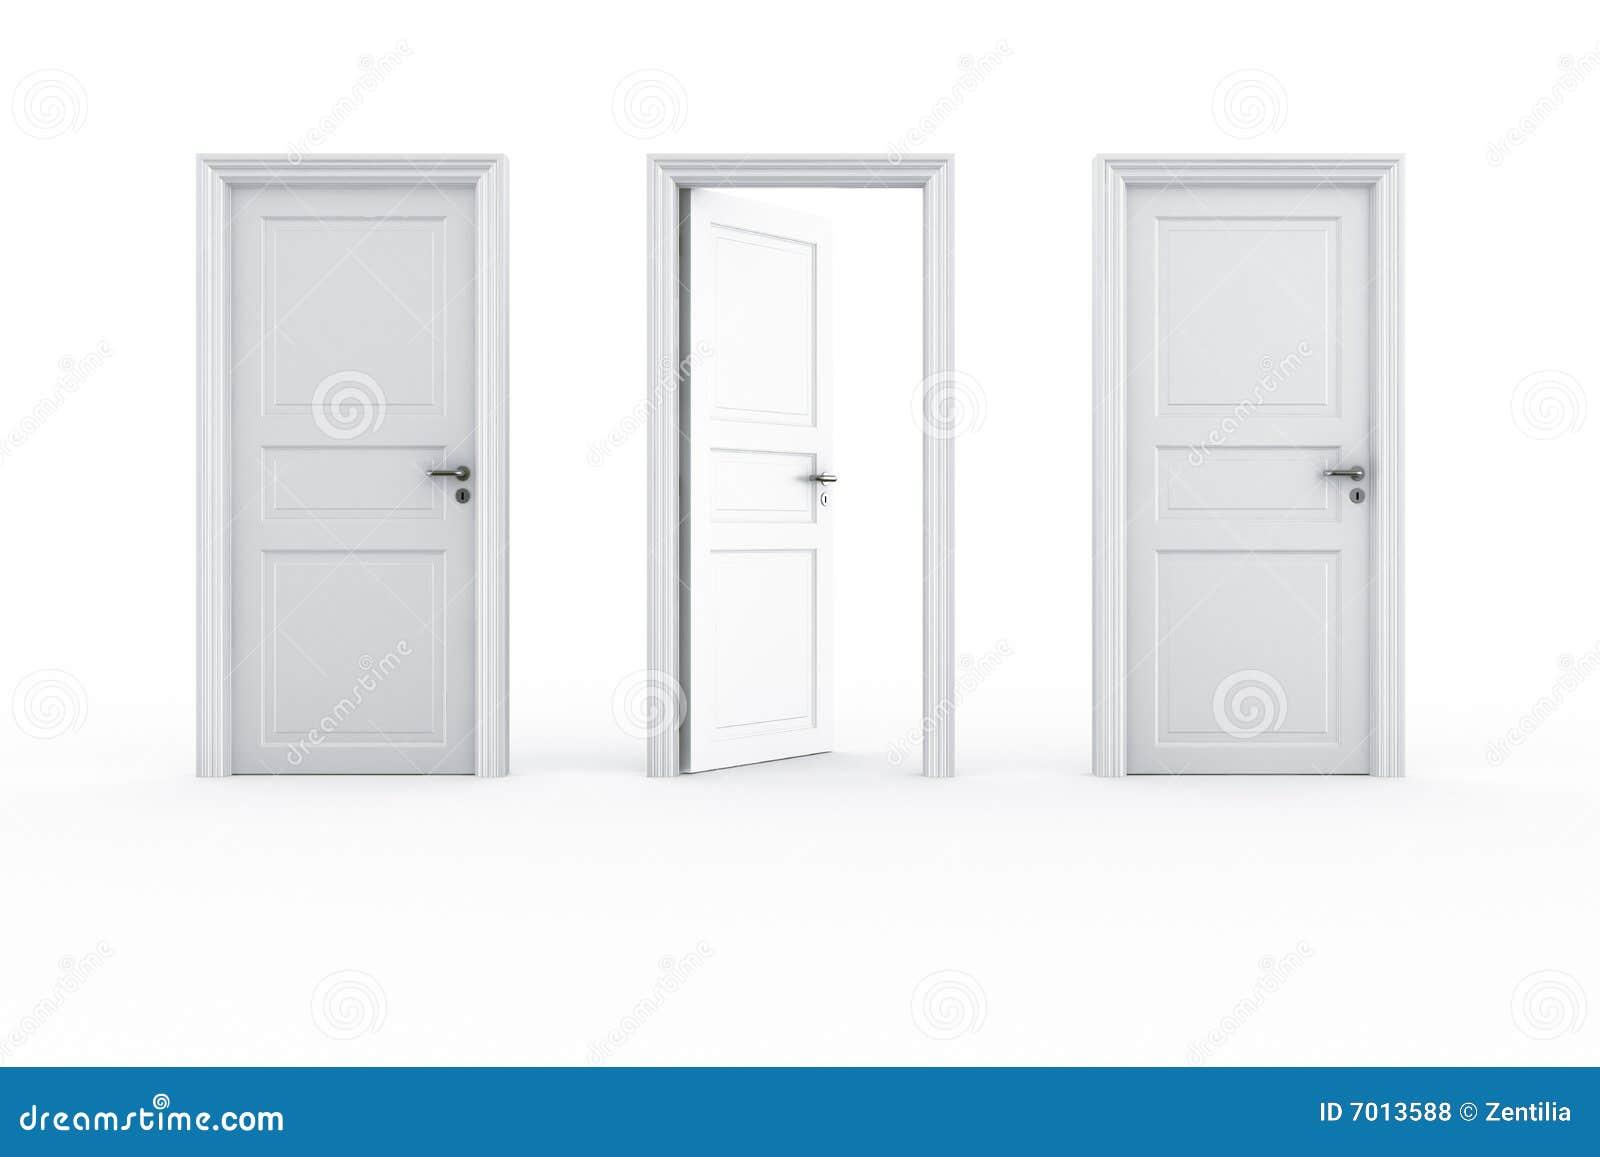 open and closed door clipart. 2 Closed Door 1 Open And Clipart